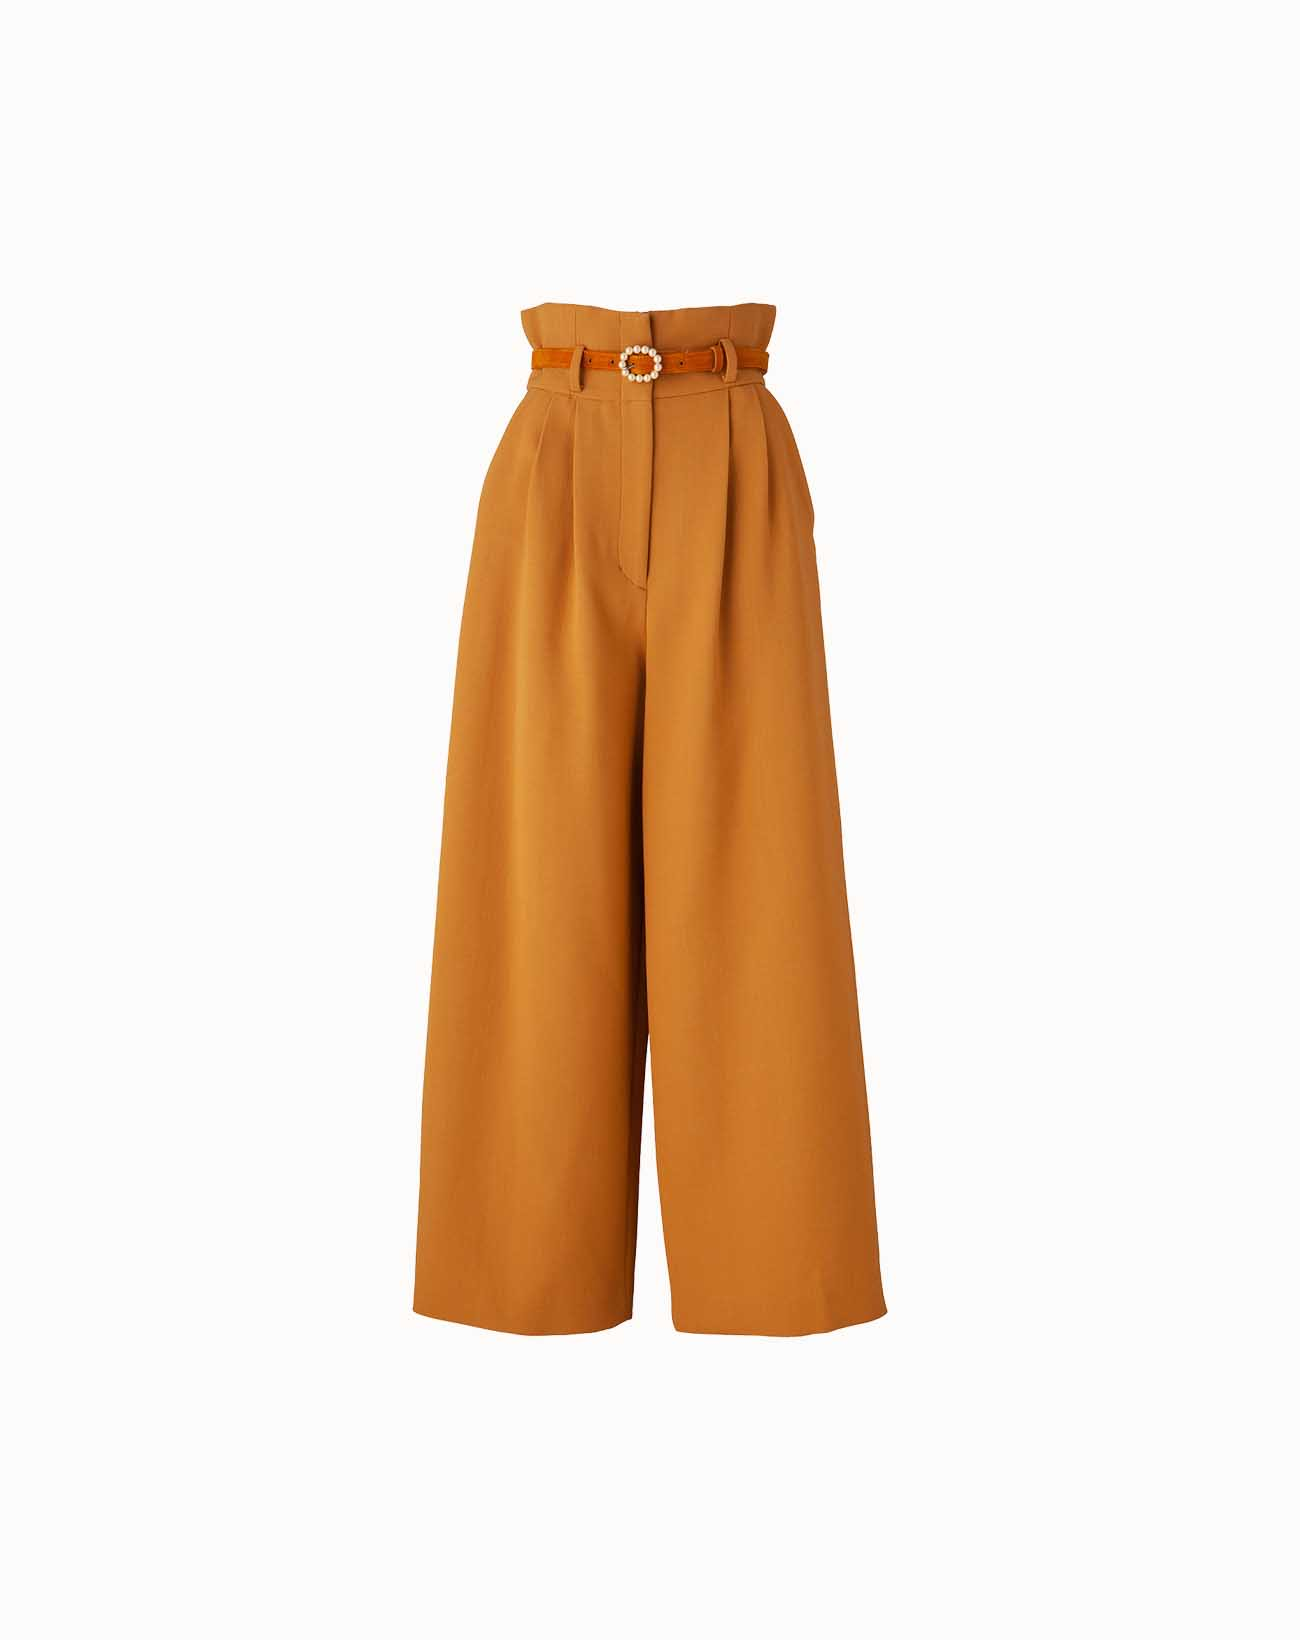 leur logette - Wool Triple Cloth Pants - Yellow